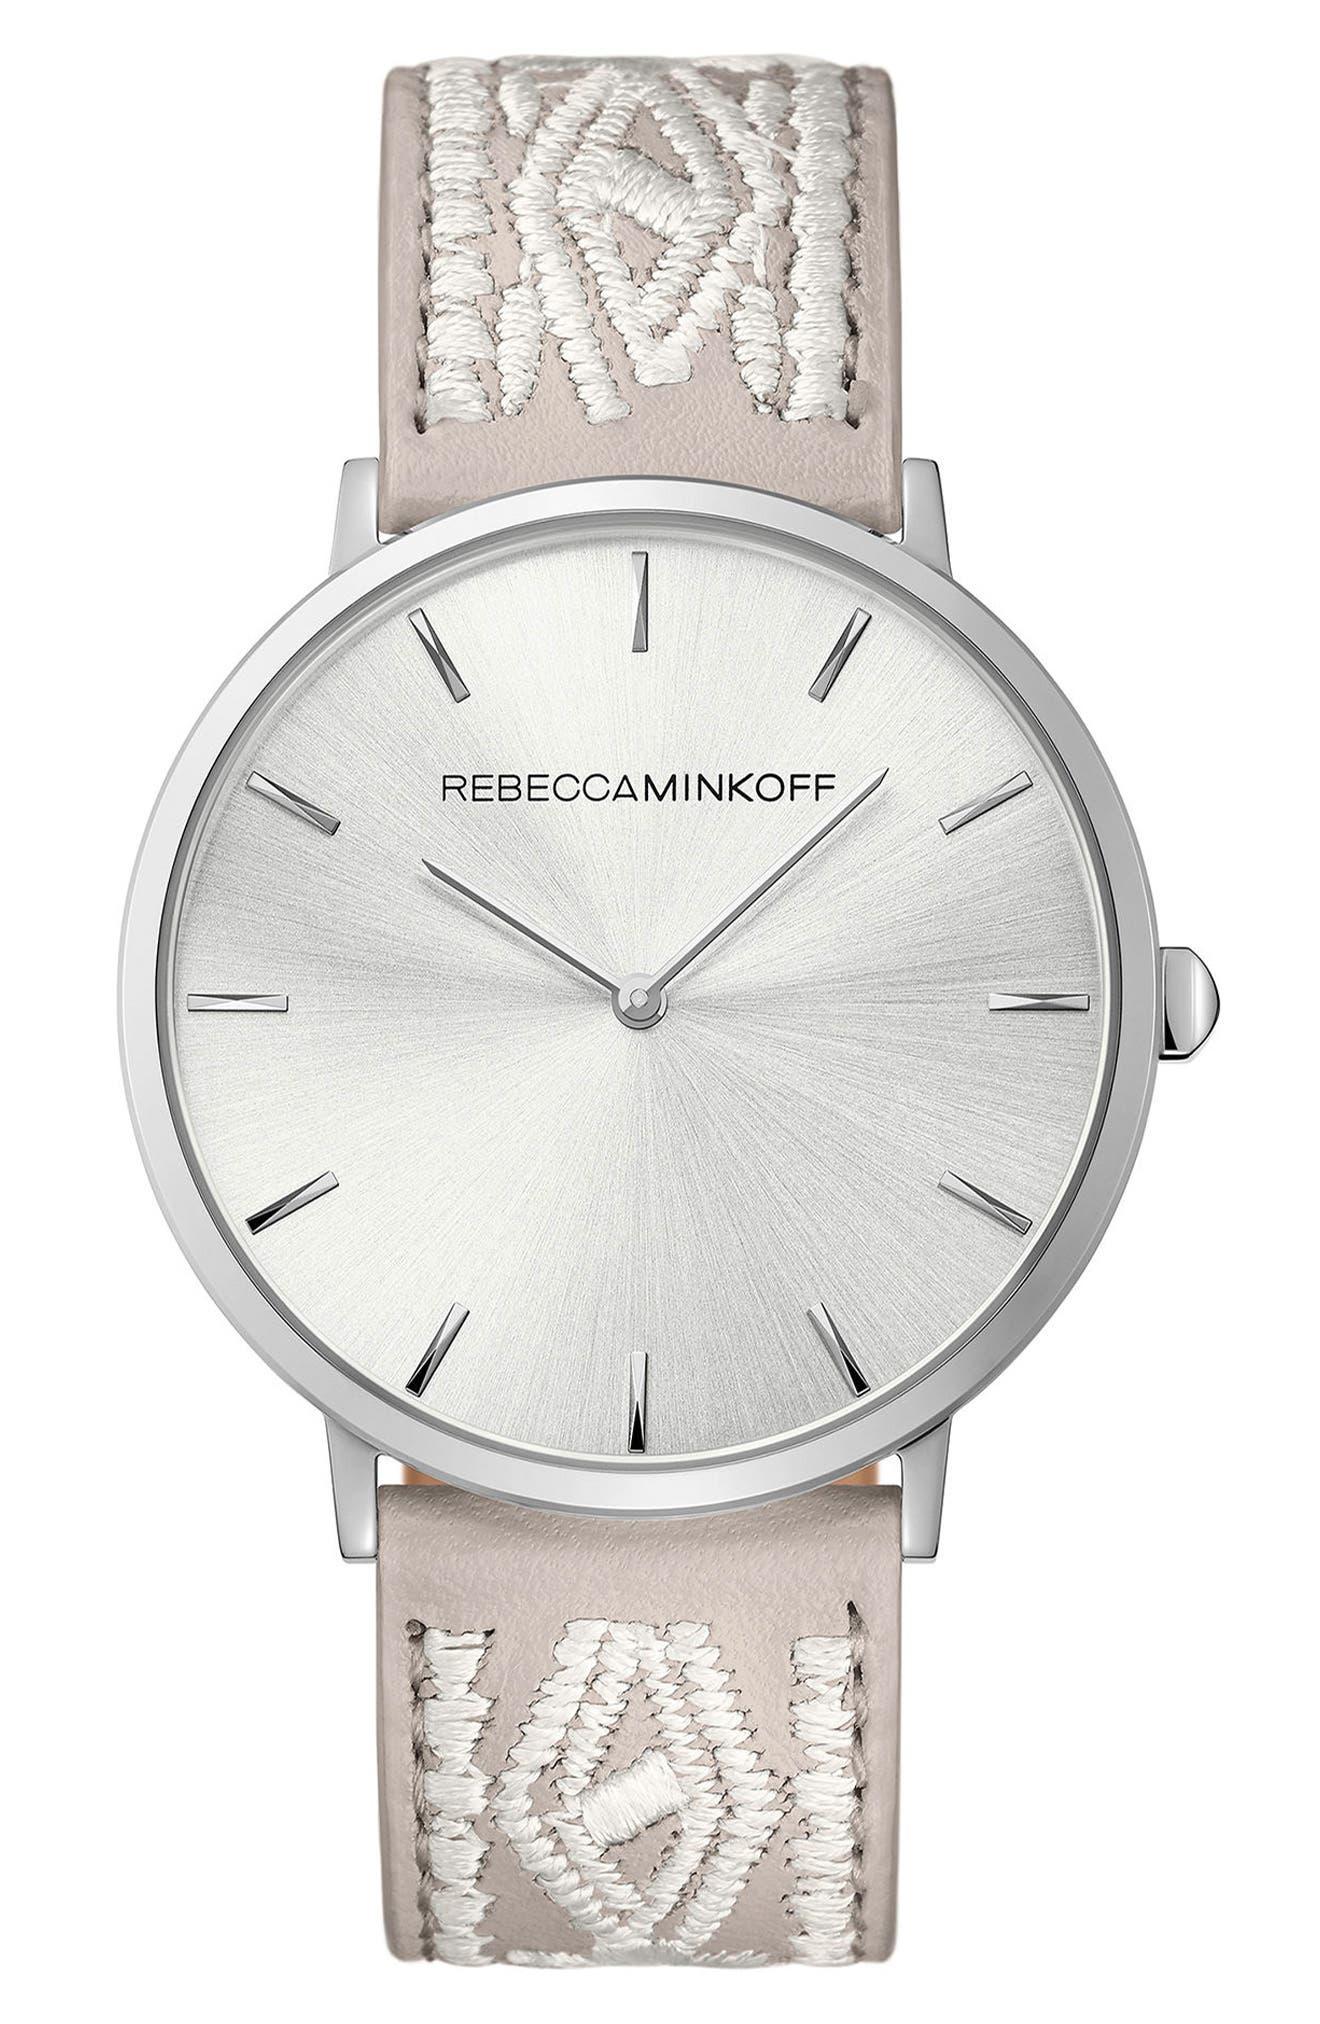 REBECCA MINKOFF Leather Strap Watch, 40mm